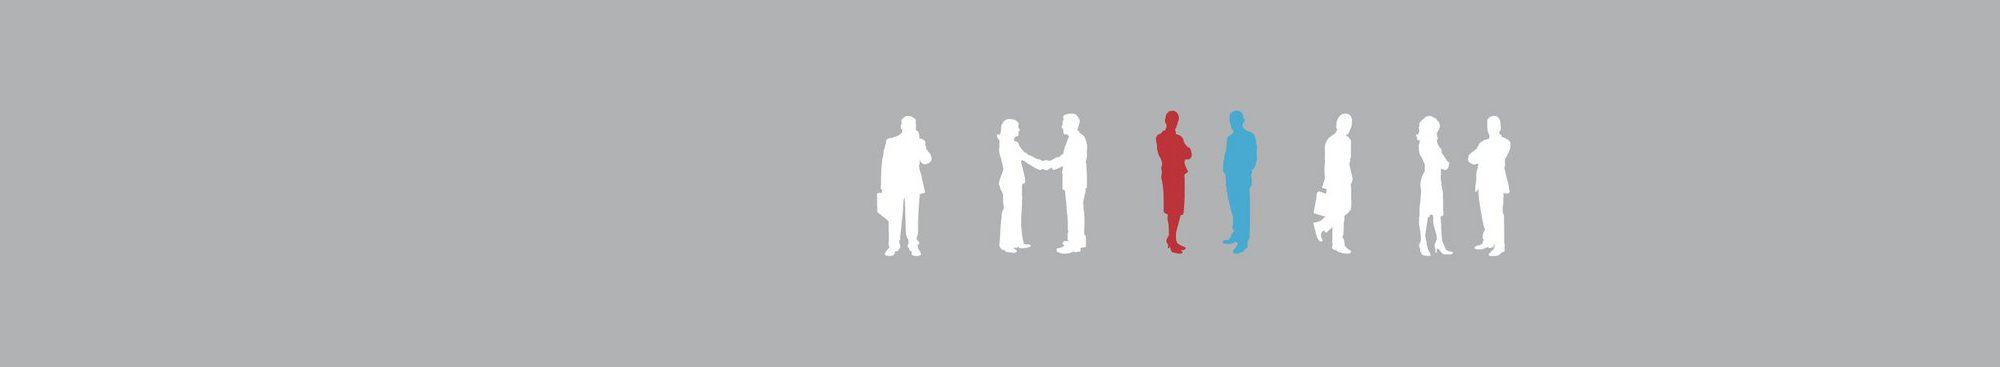 Grafik Leiste Führungskräfte